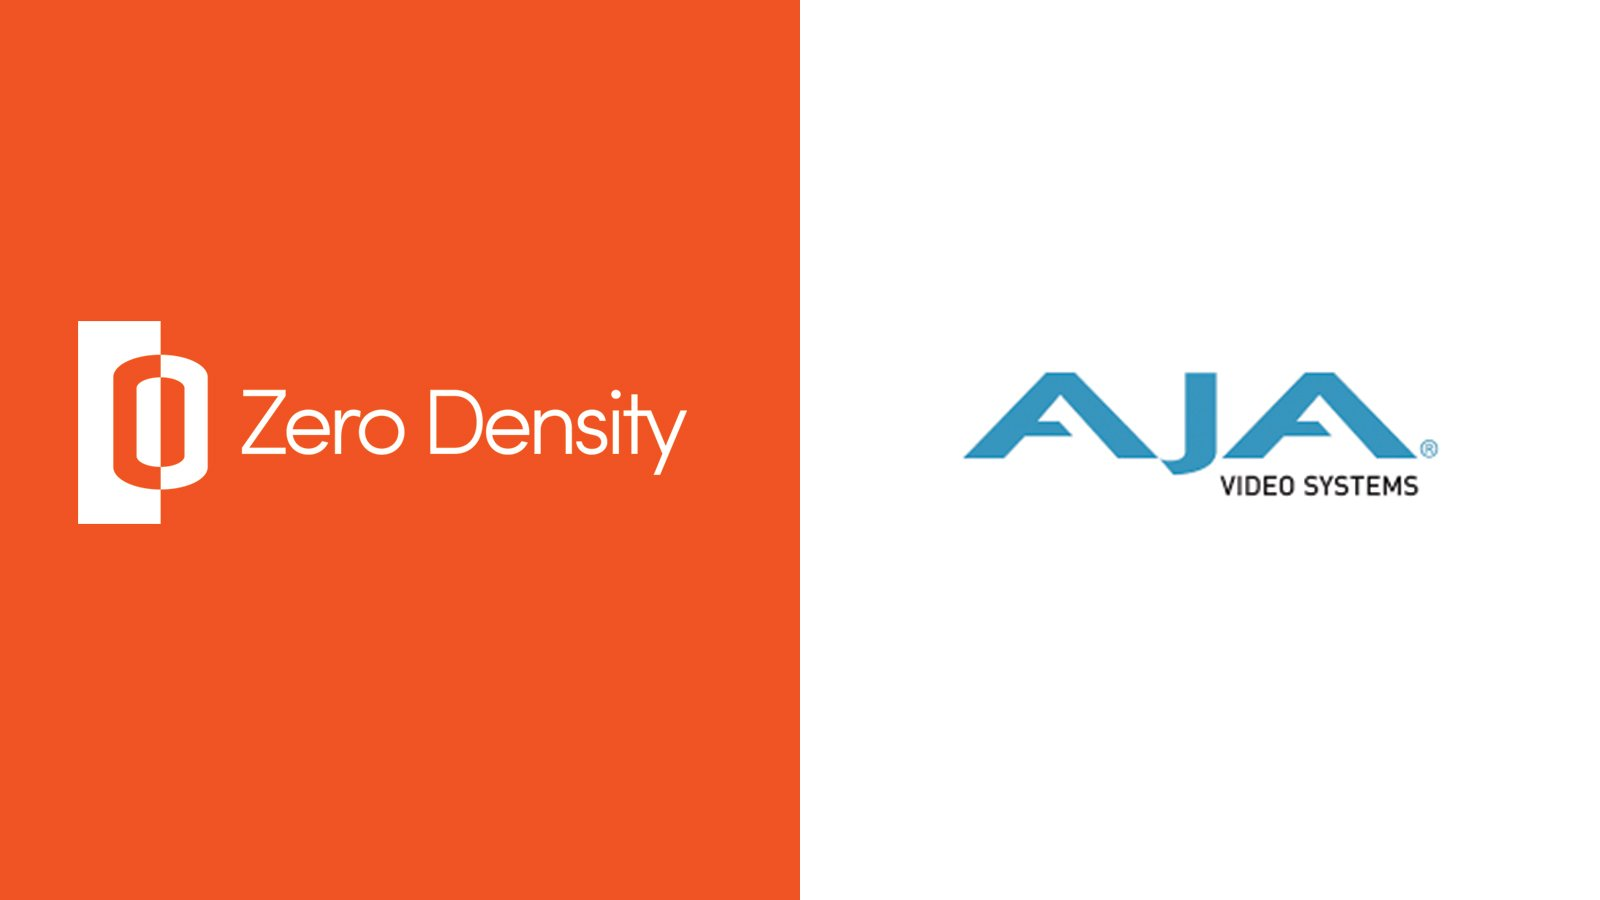 aja zero density partnership